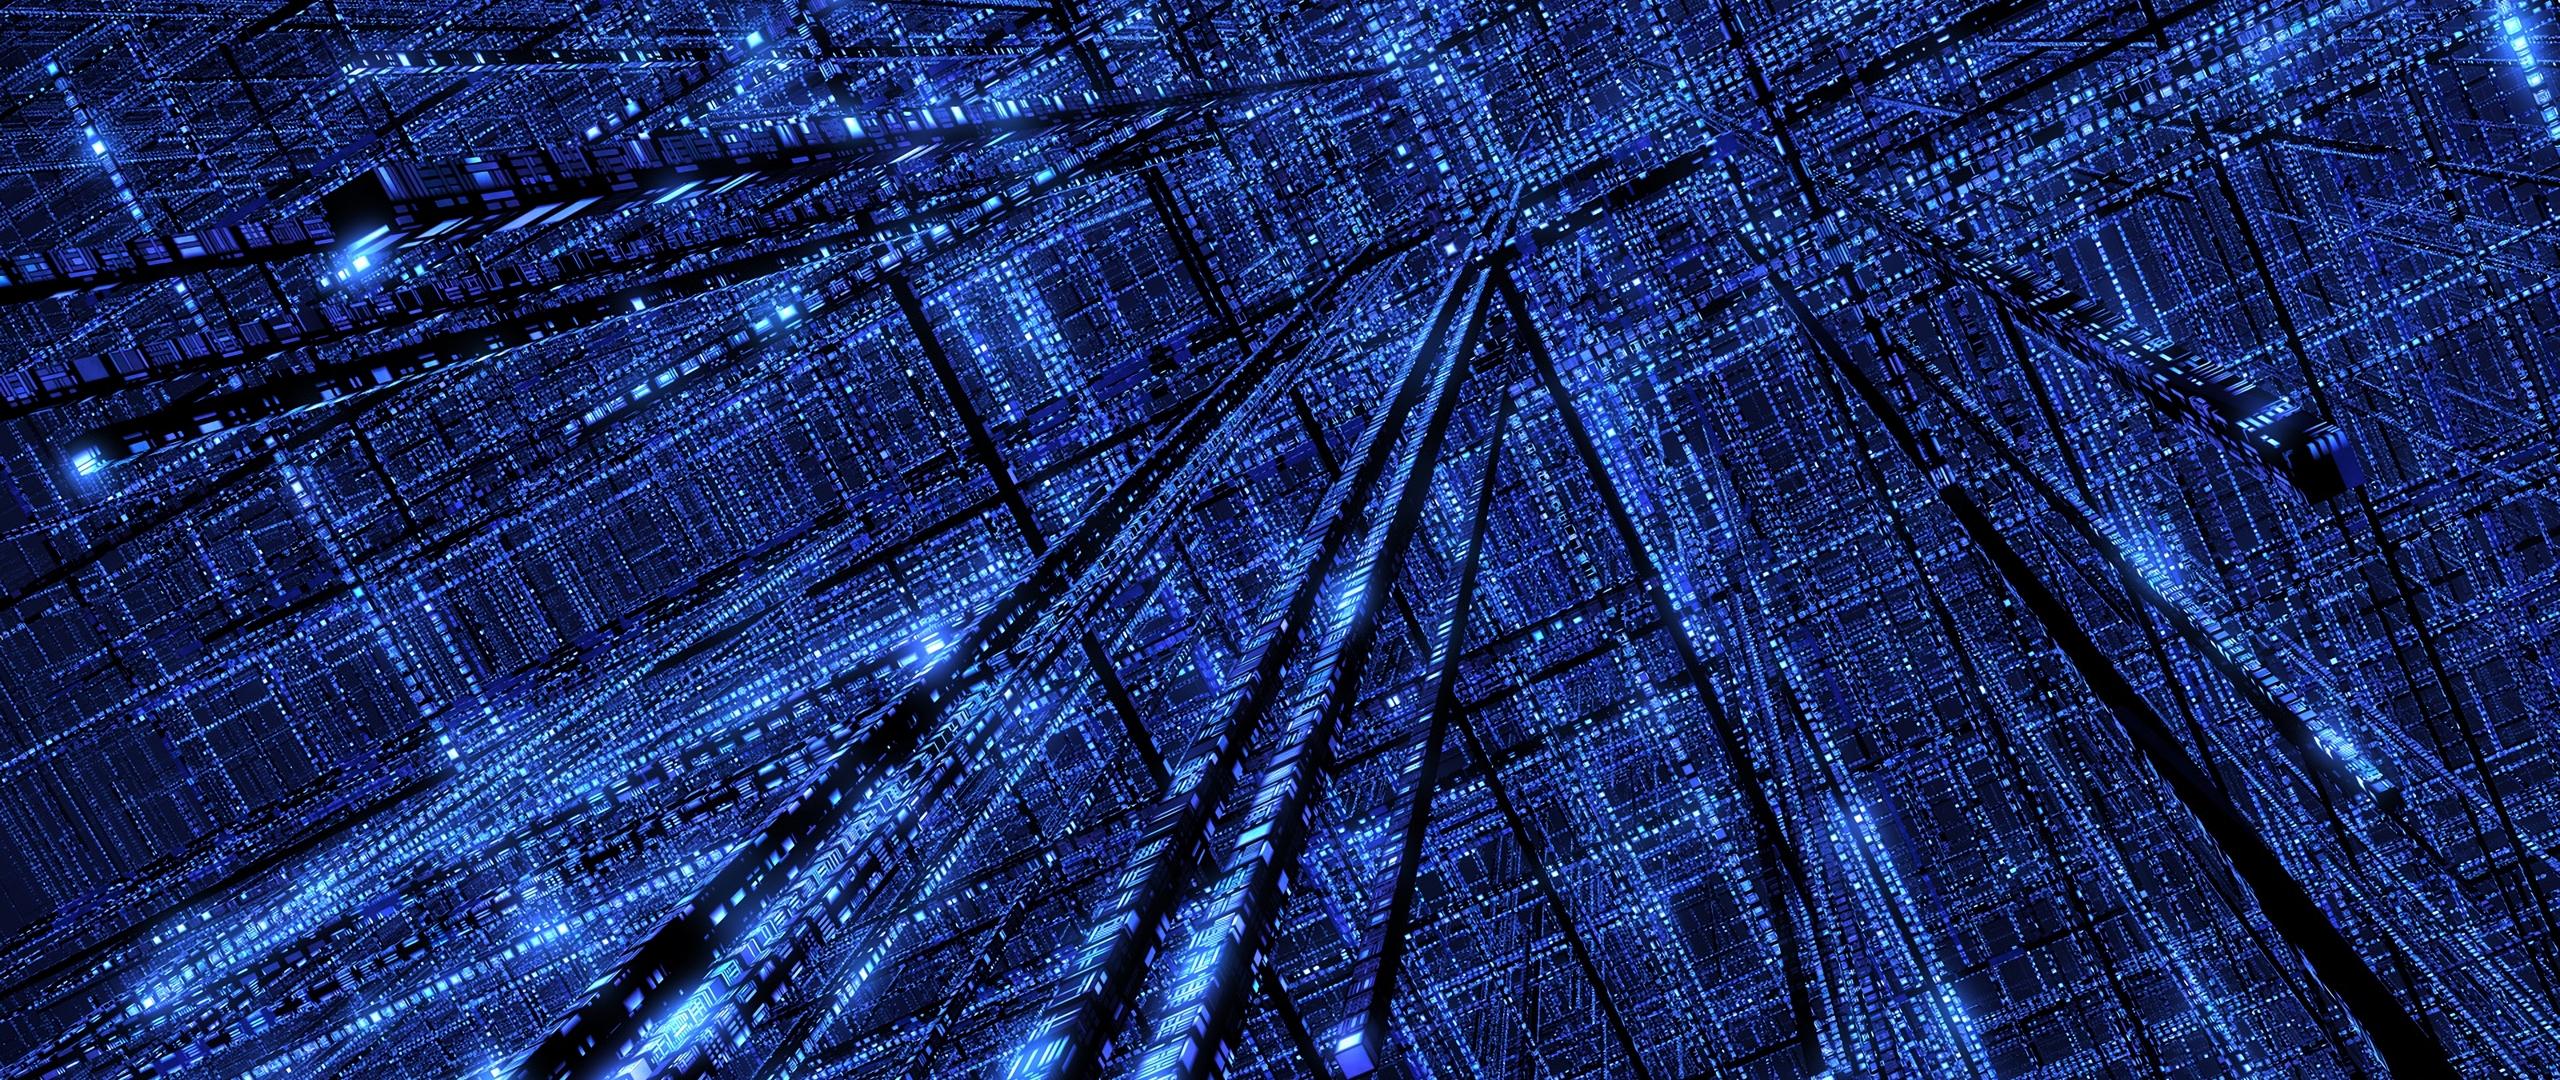 blue-lights-fix-4k-uw.jpg